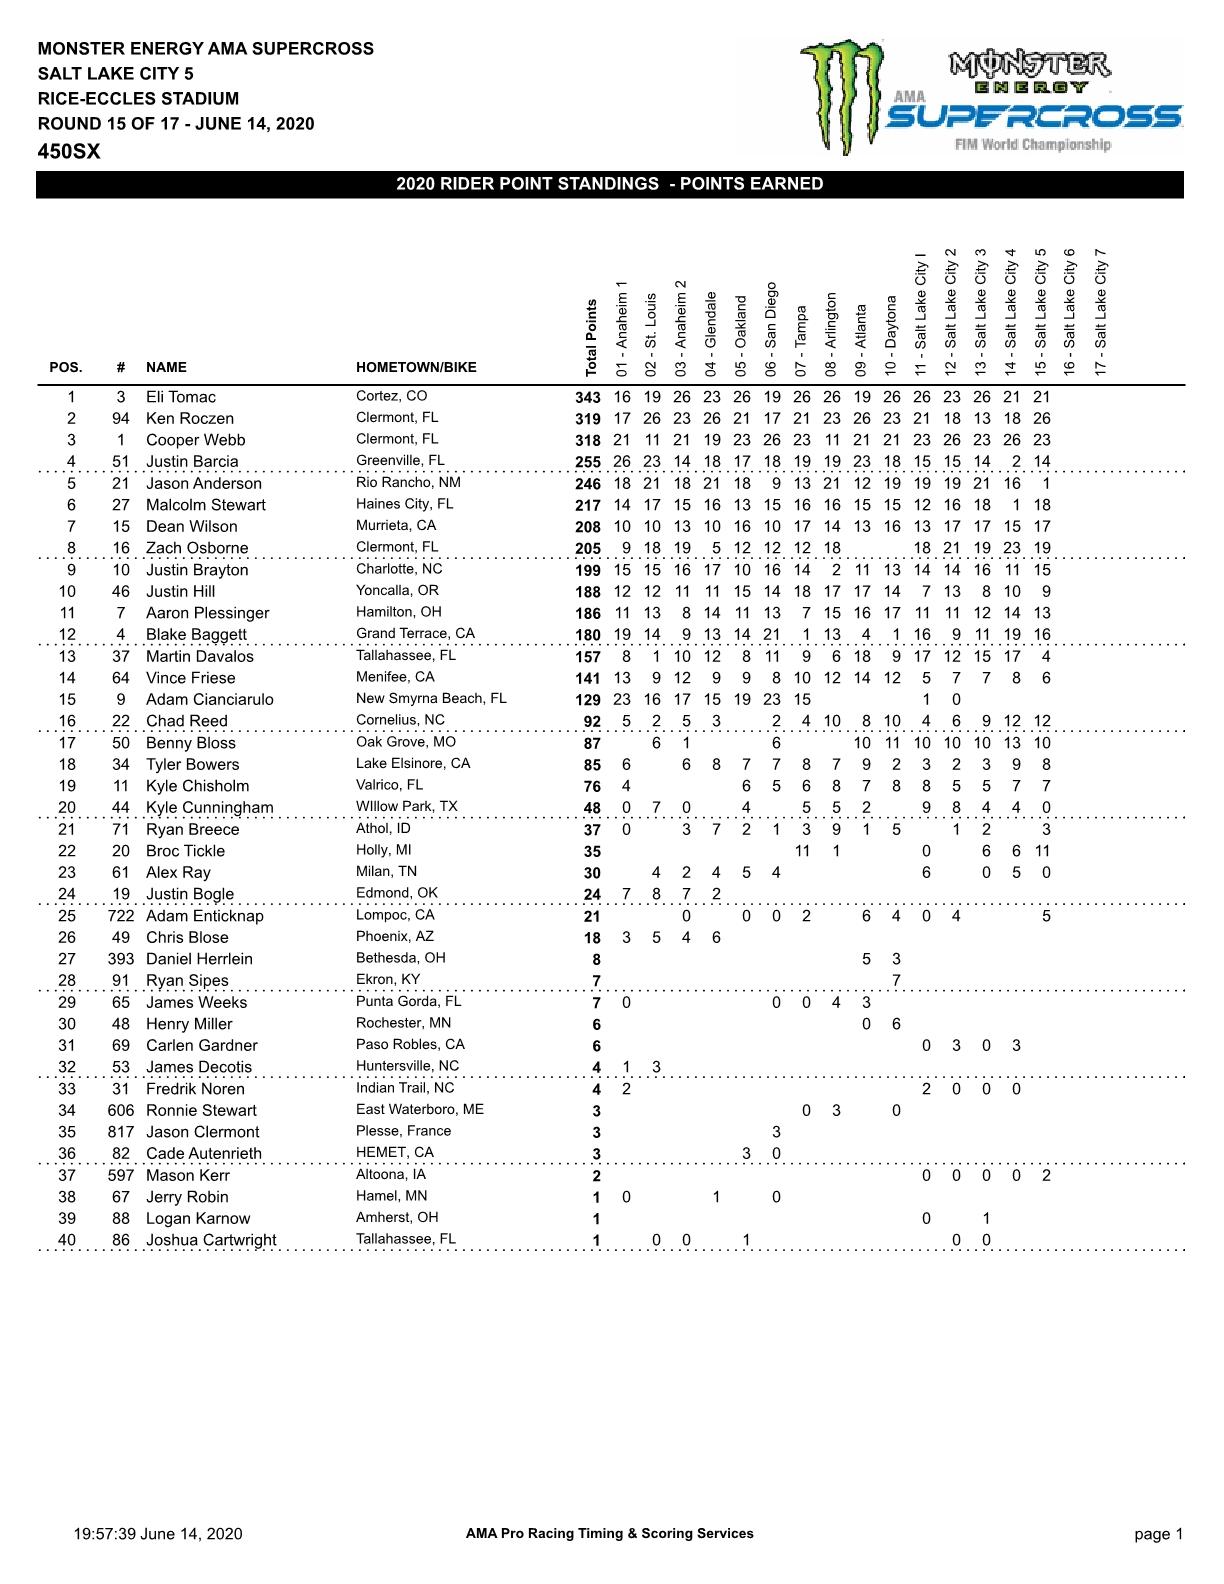 Sx-Salt-Lake-City-5-championship-450-20201